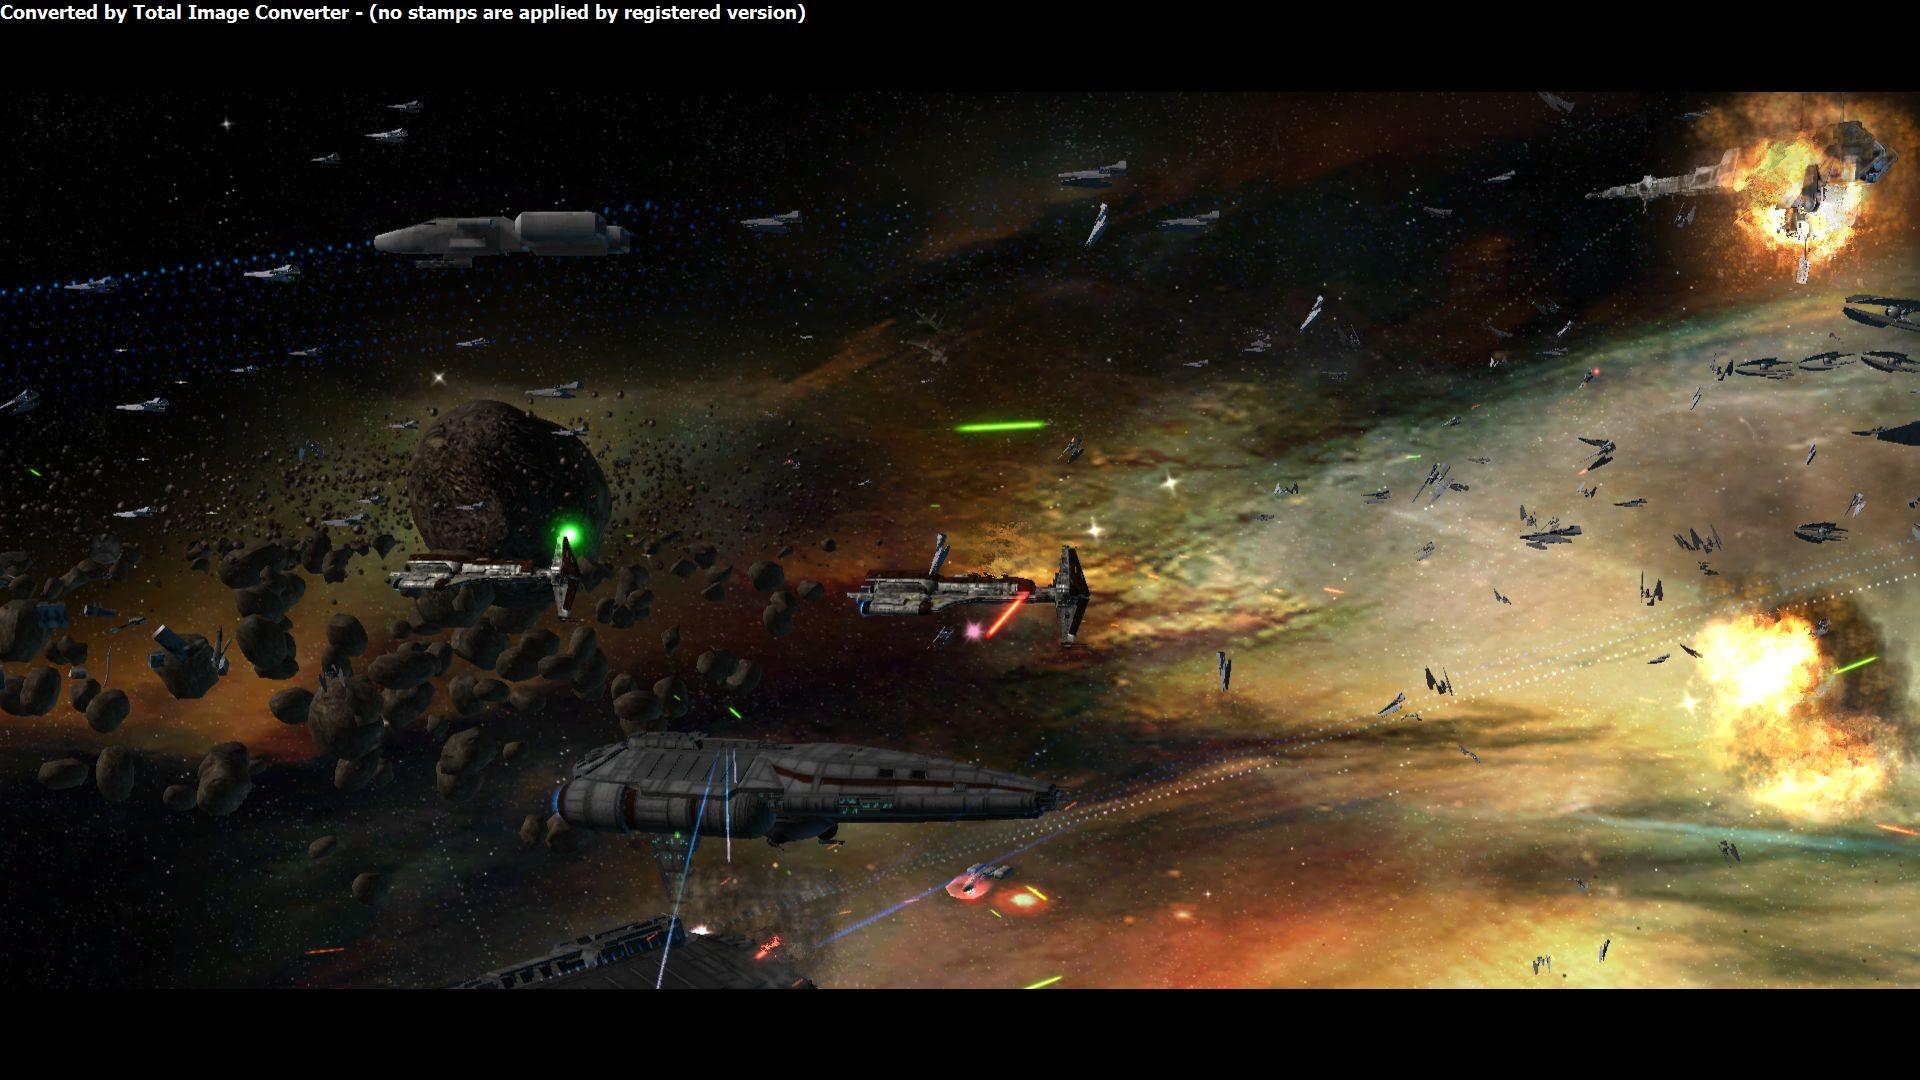 Free Download Star Wars Space Battle Wallpaper 61 Images 1920x1080 For Your Desktop Mobile Tablet Explore 56 Star Wars Clone Wars Space Background Star Wars Clone Wars Space Background